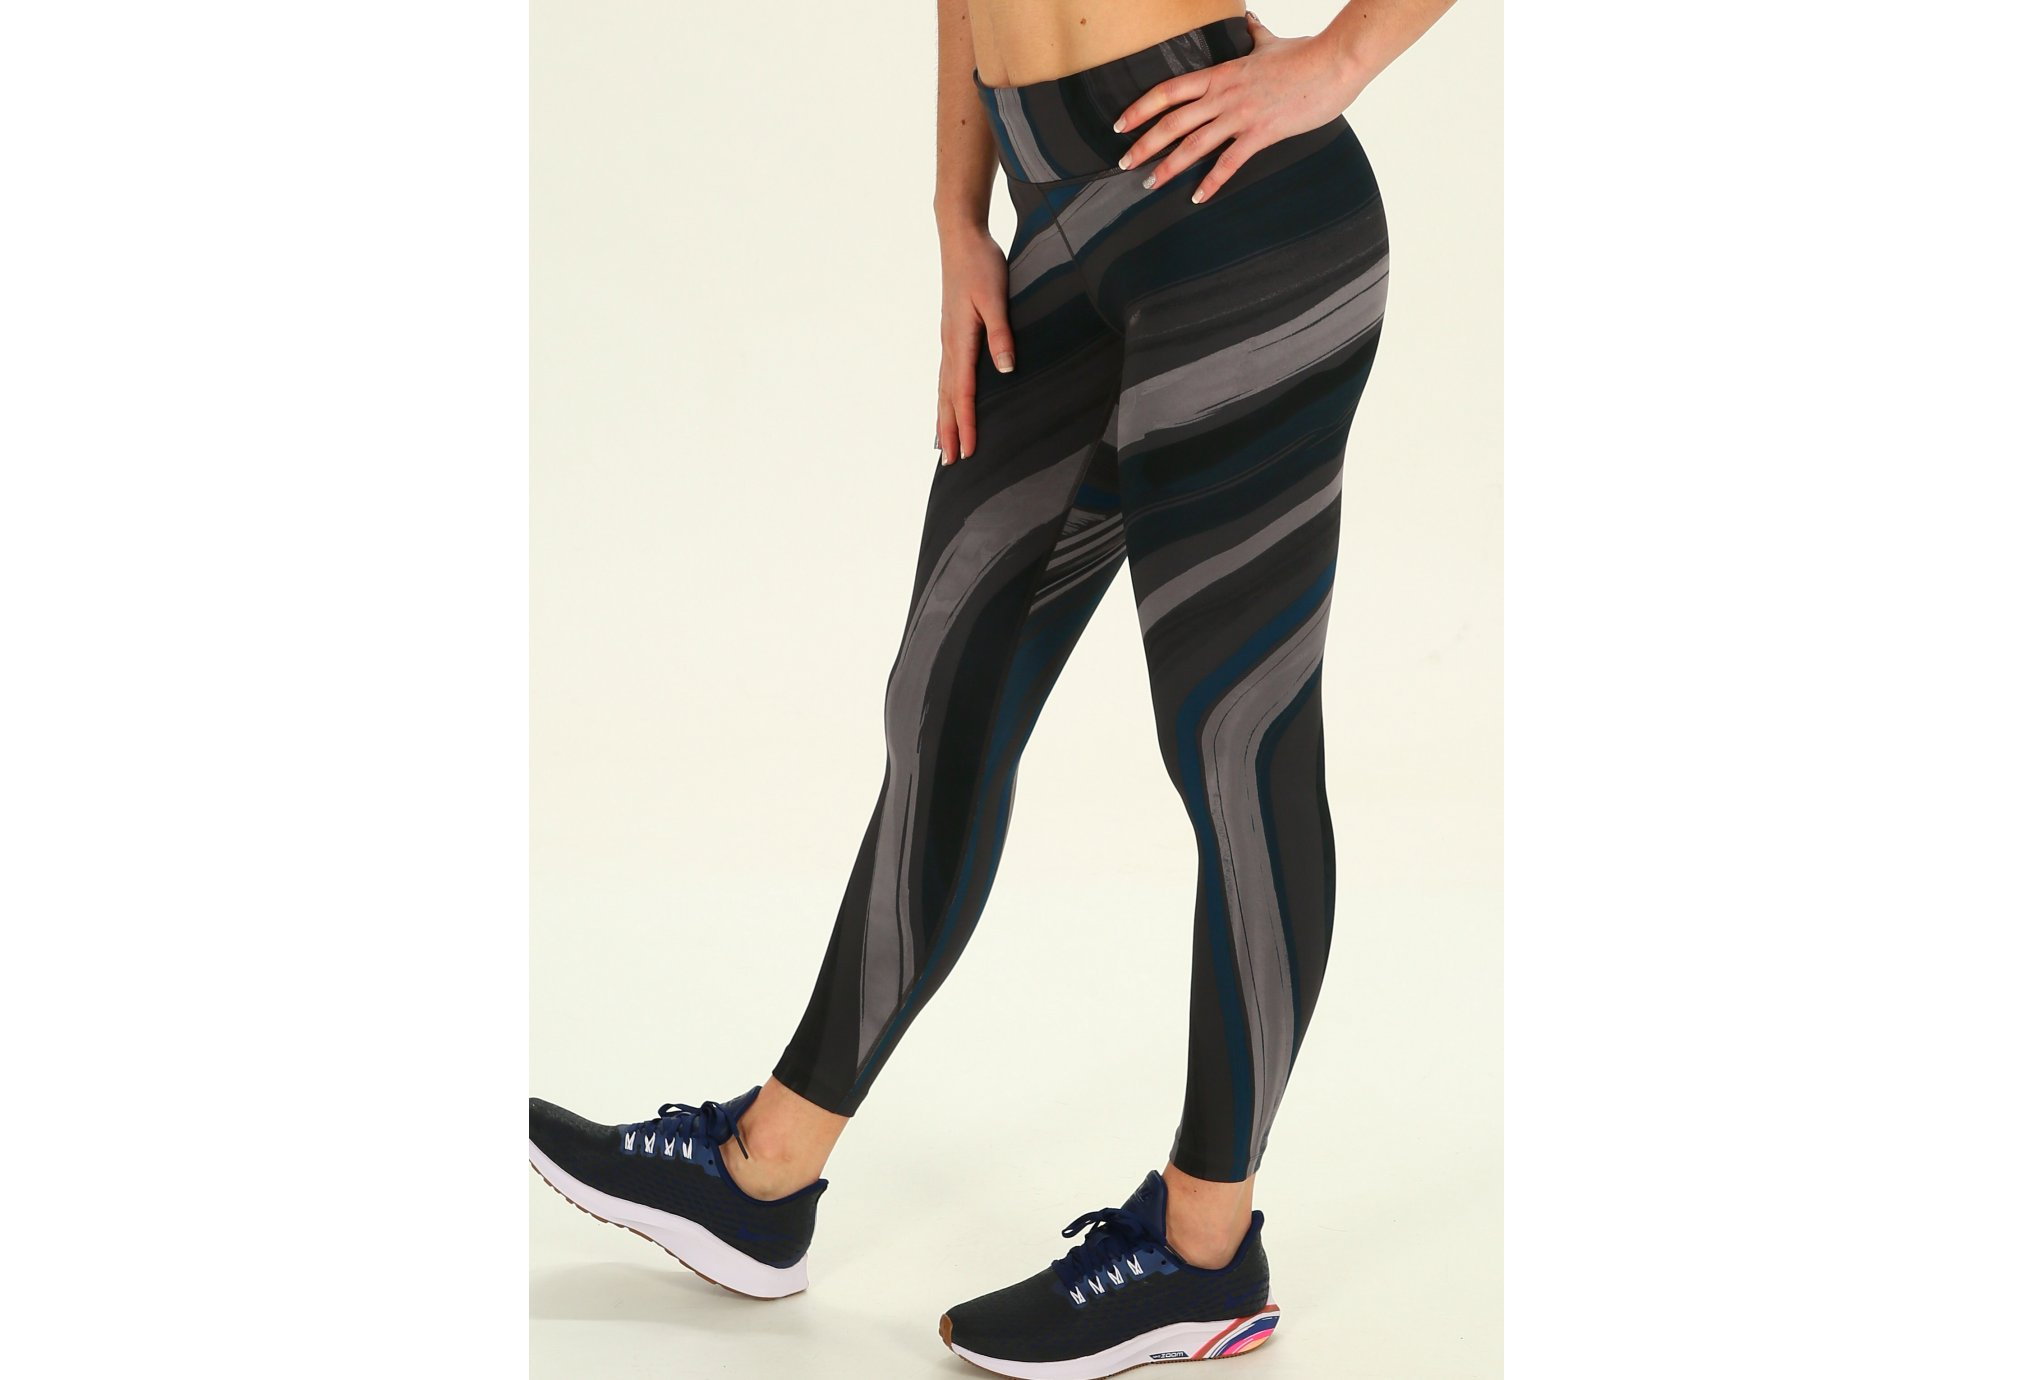 a604153a200 Nike Epic Lux 7 8 Eva W vêtement running femme